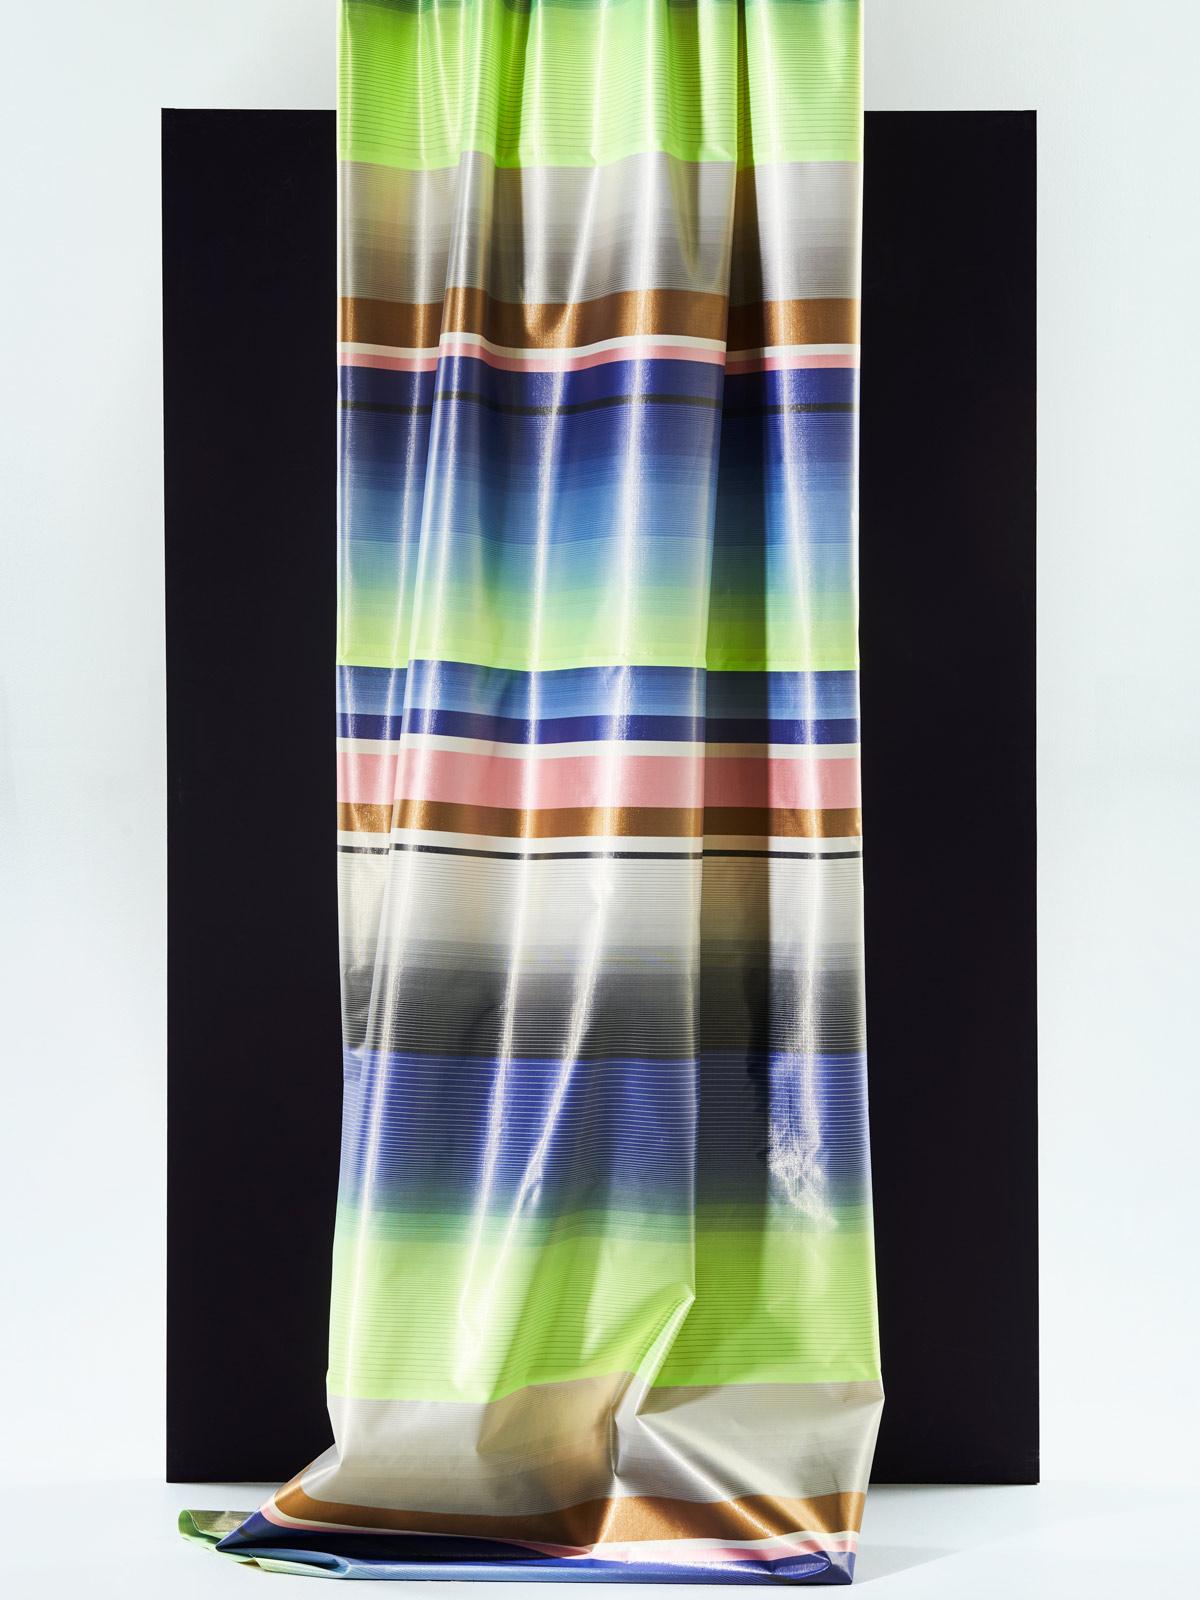 bernhard duss-jakob schlaepfer-wallcoverings-textiledesign-tapeten-designer-custom made wallcovering-inkjetprint-interiorfabrics-interior collection-weaving-jacuardfabric